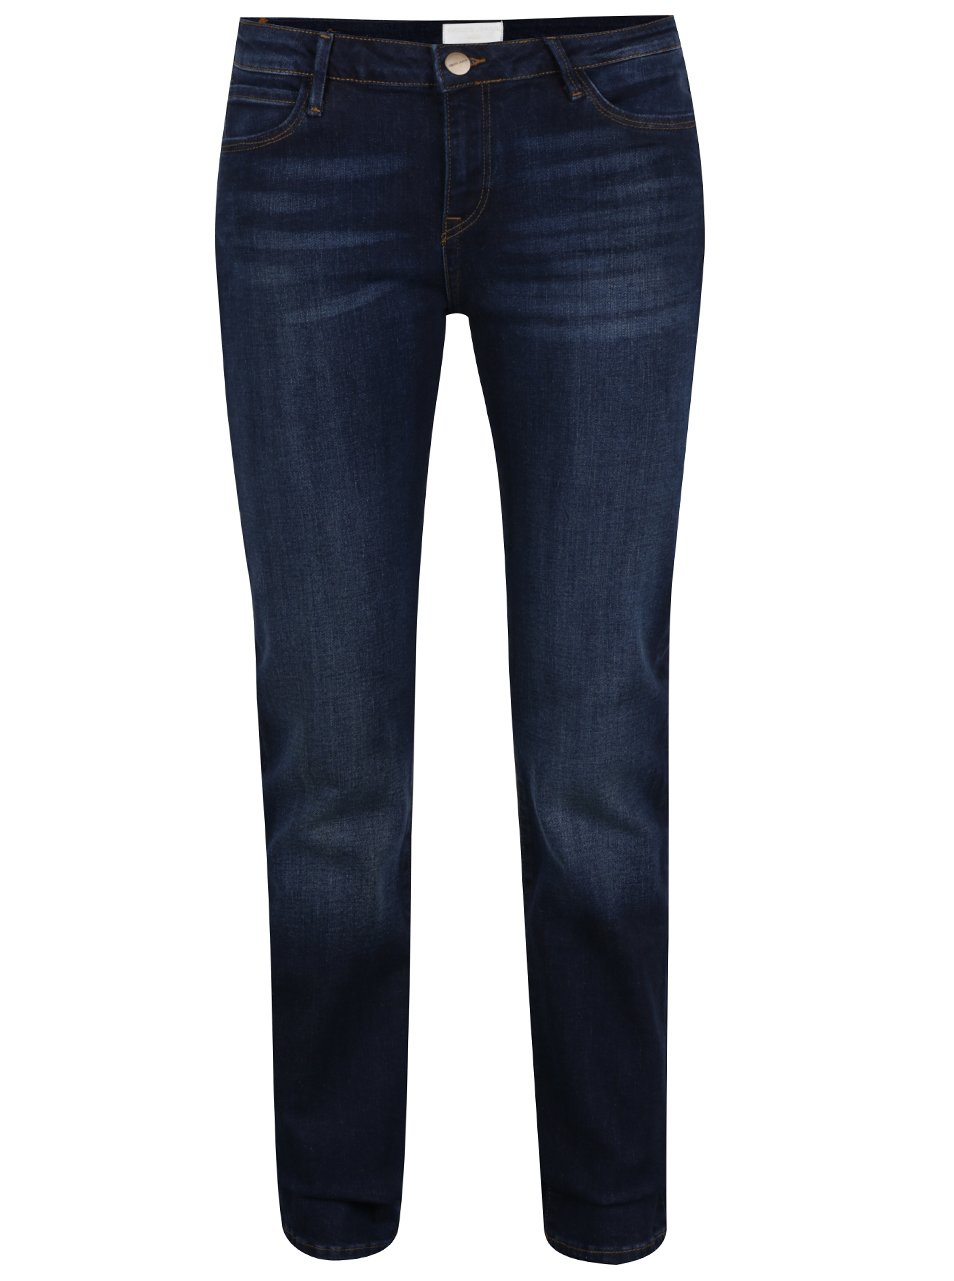 Tmavě modré dámské džíny Cross Jeans Elsa